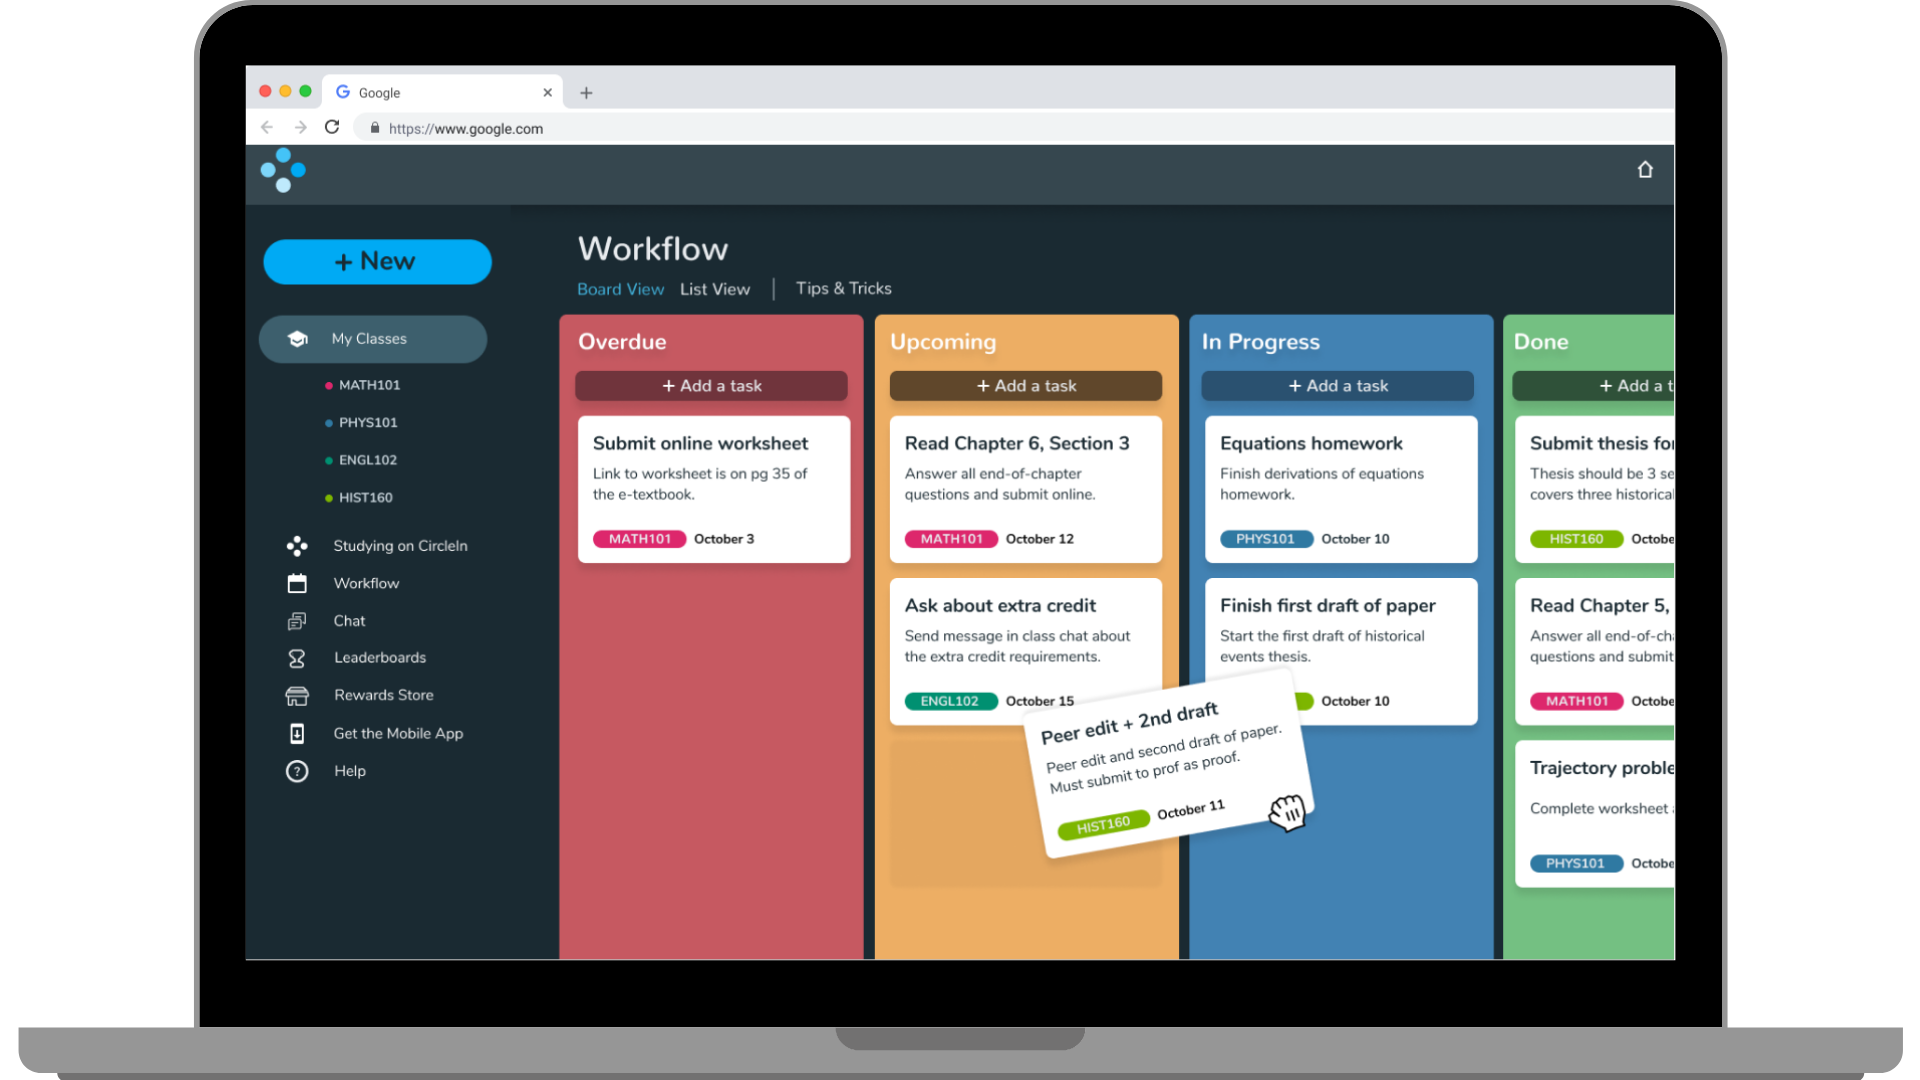 Workflow on Web